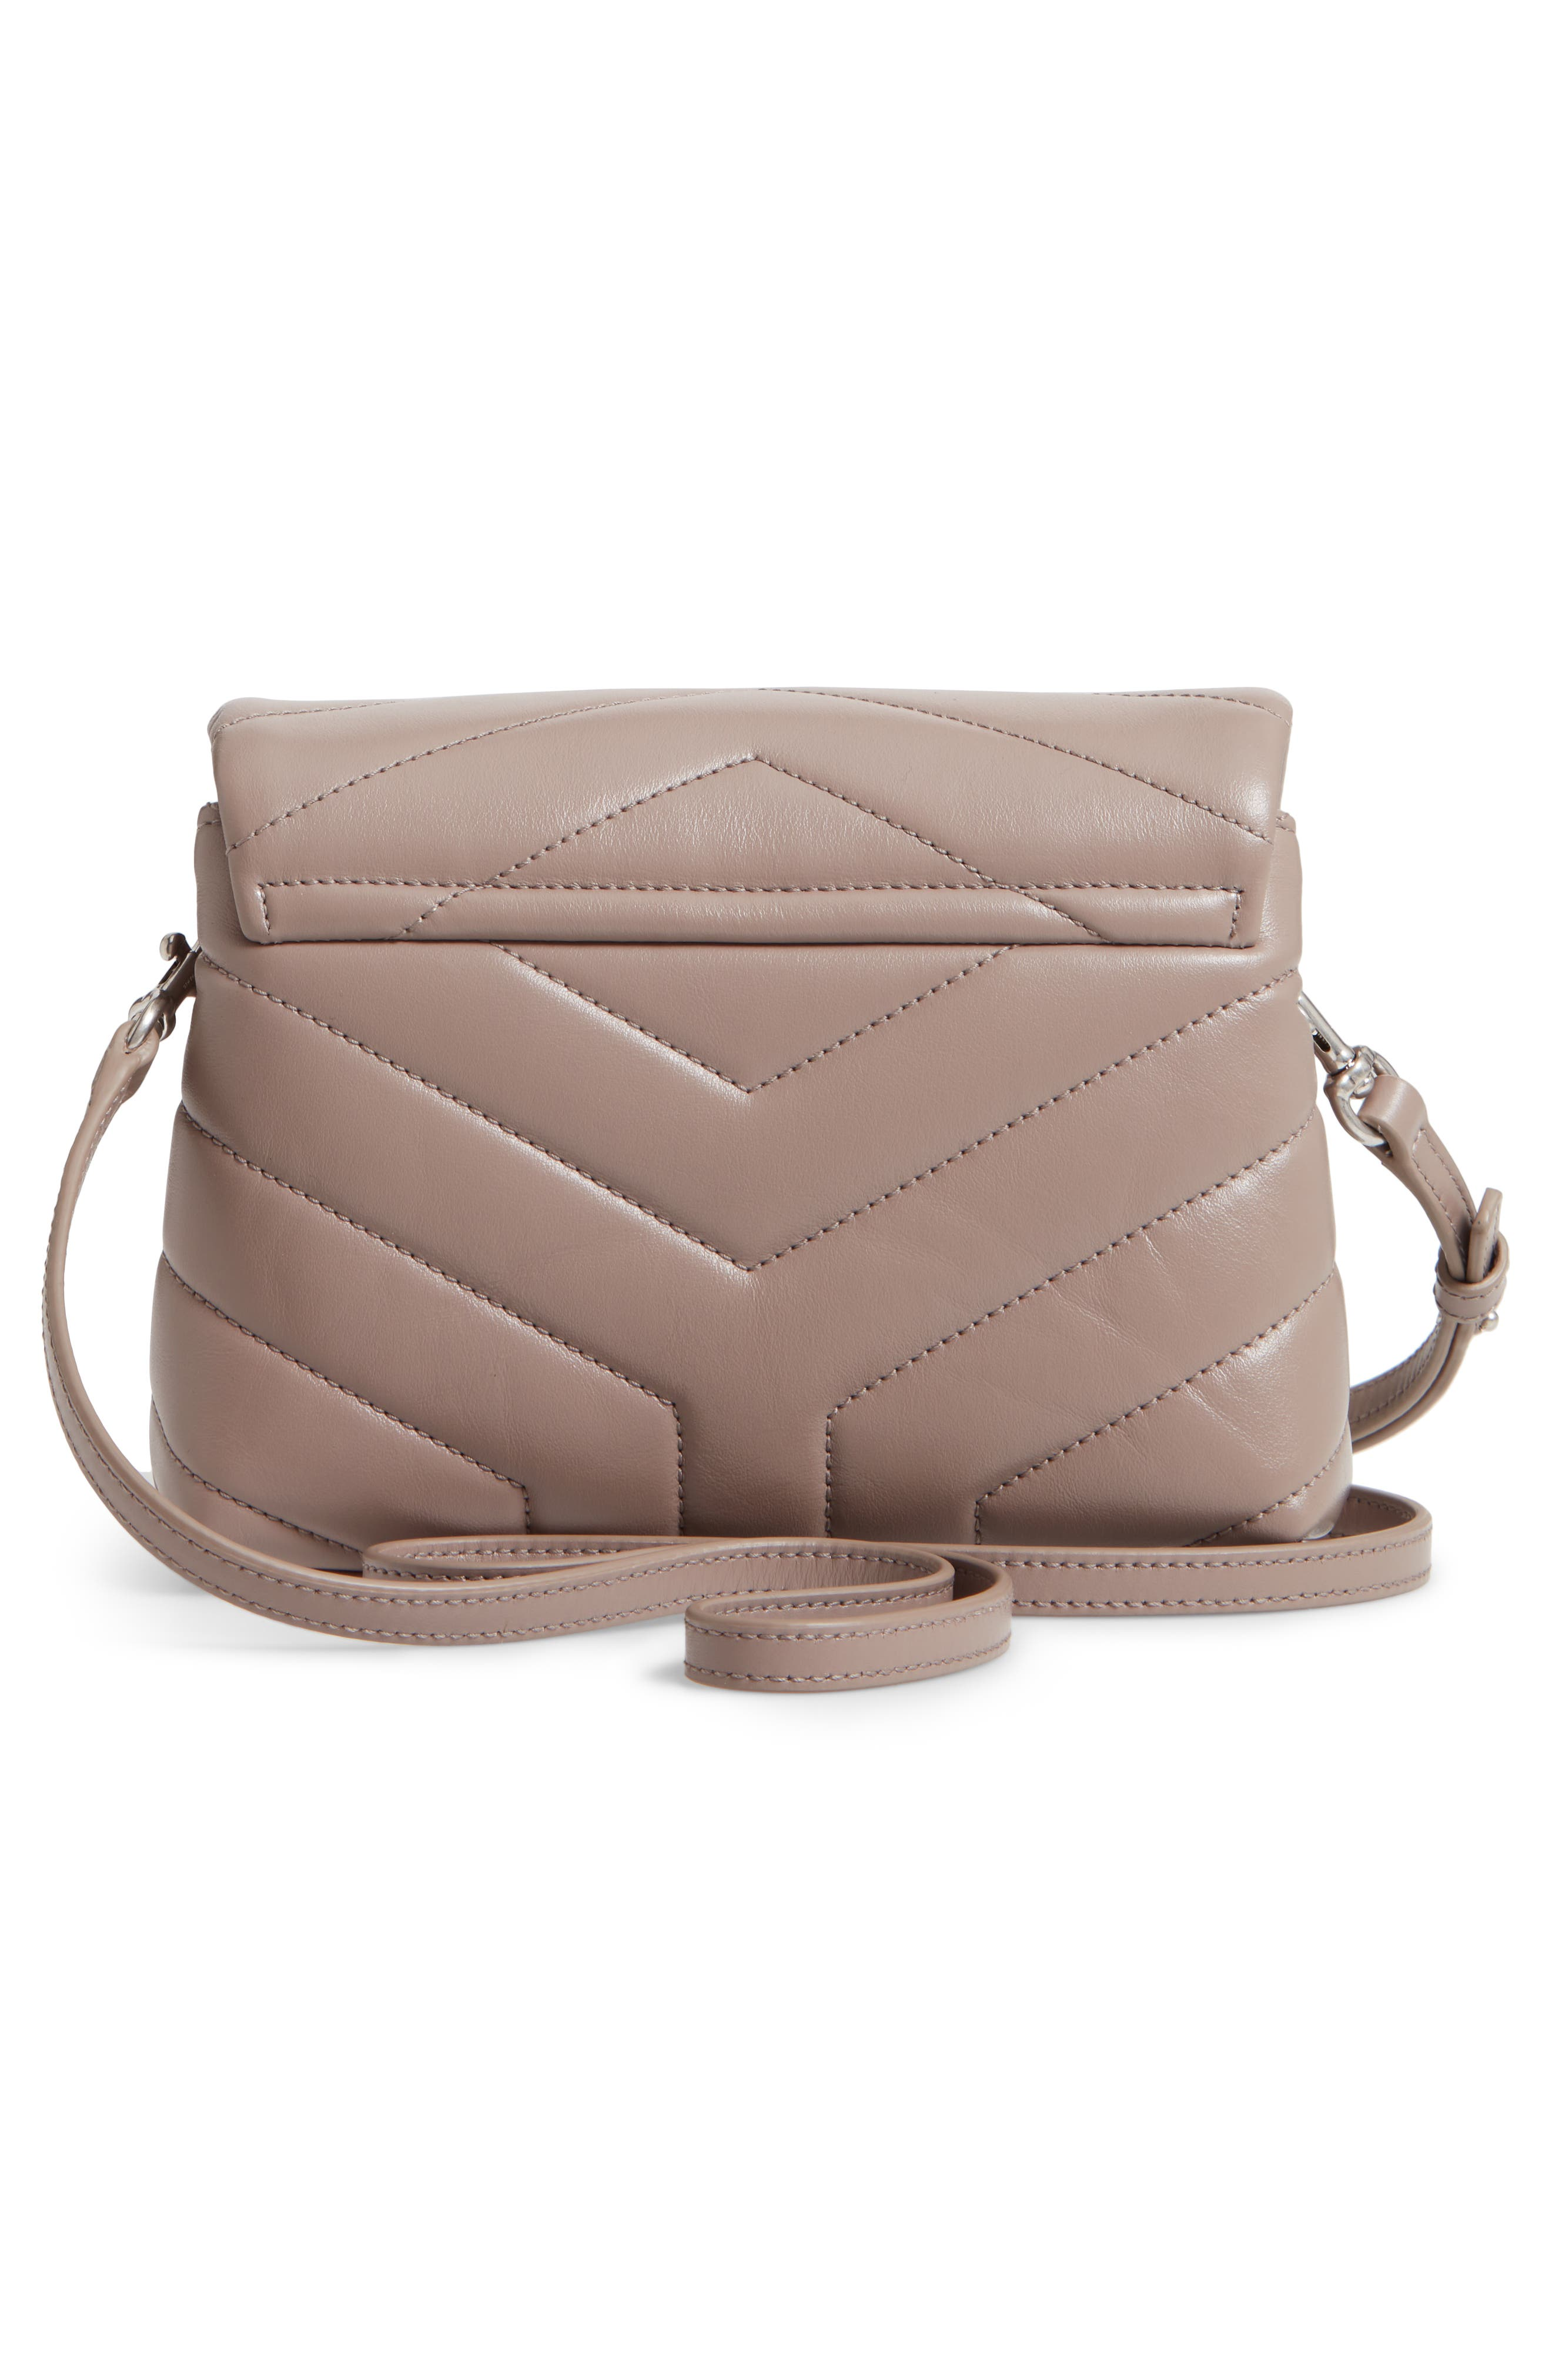 SAINT LAURENT, Toy Loulou Calfskin Leather Crossbody Bag, Alternate thumbnail 3, color, MINK